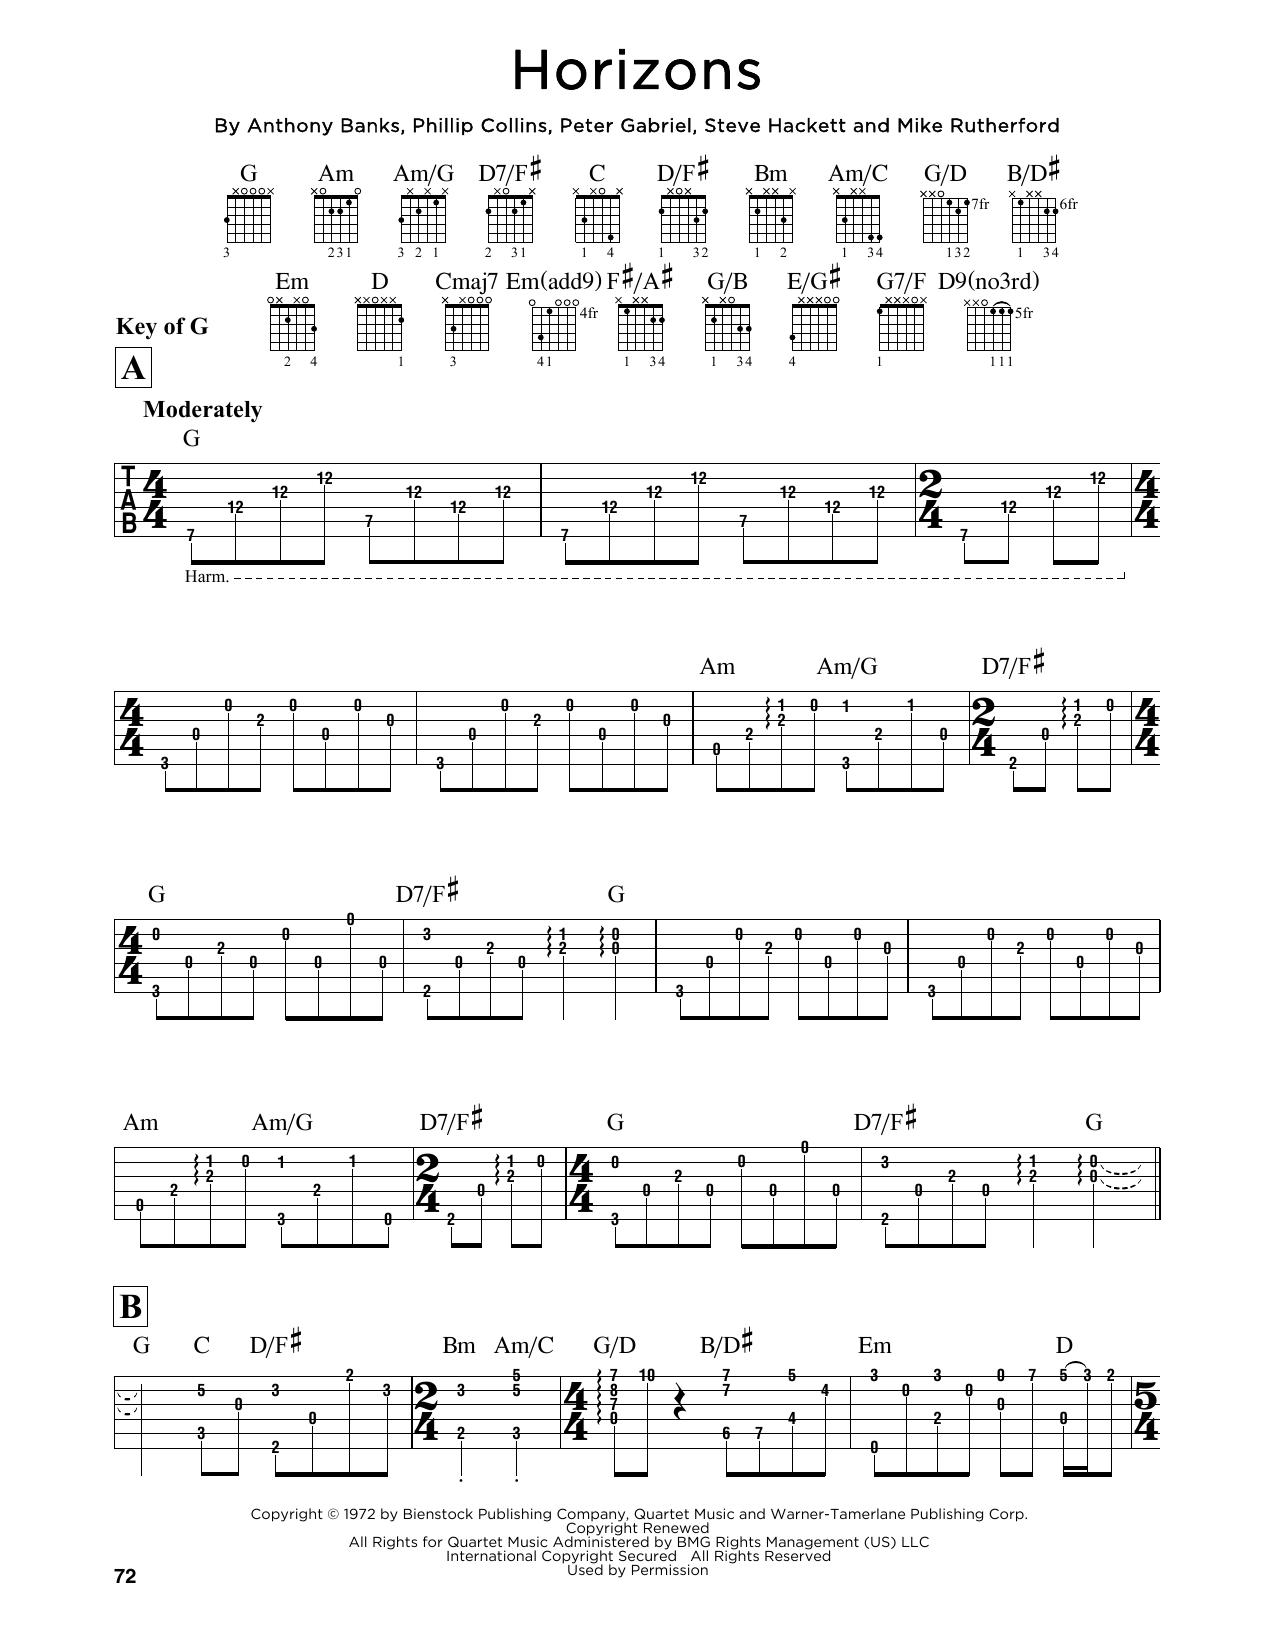 Sheet Music Digital Files To Print - Licensed Steve Hackett Digital Sheet Music